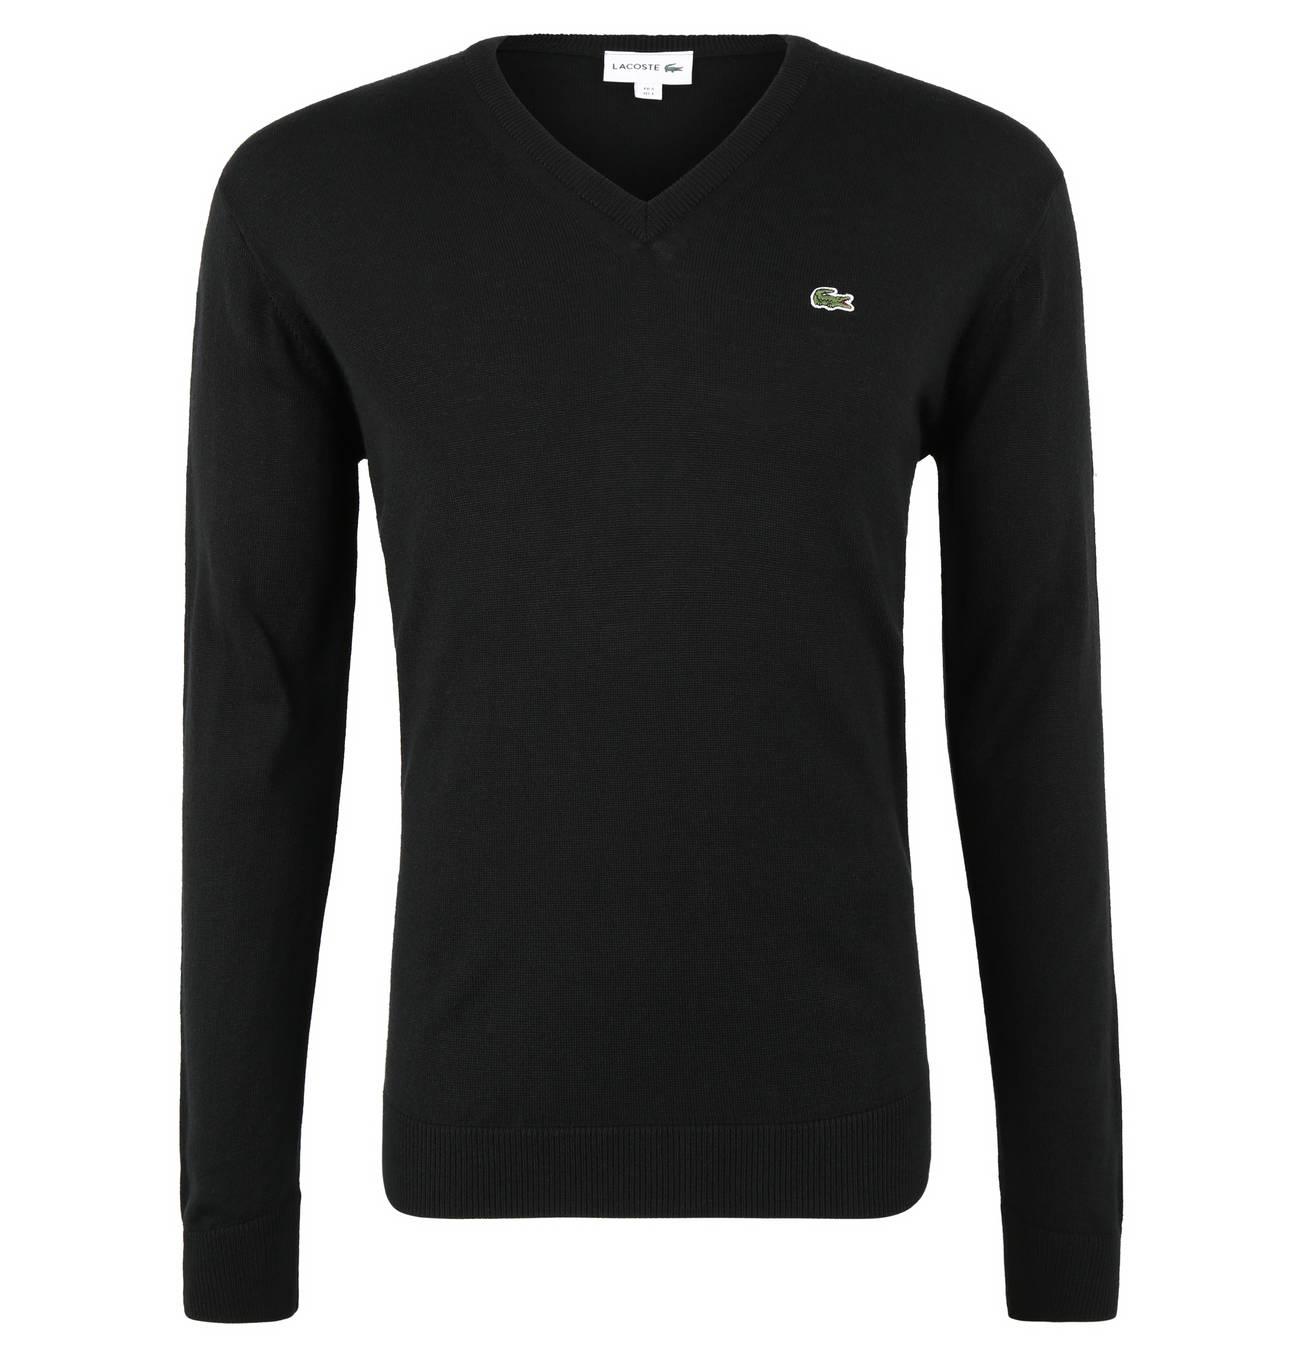 Jesse James 1563 Herren Strick Pullover Sweater Fitness